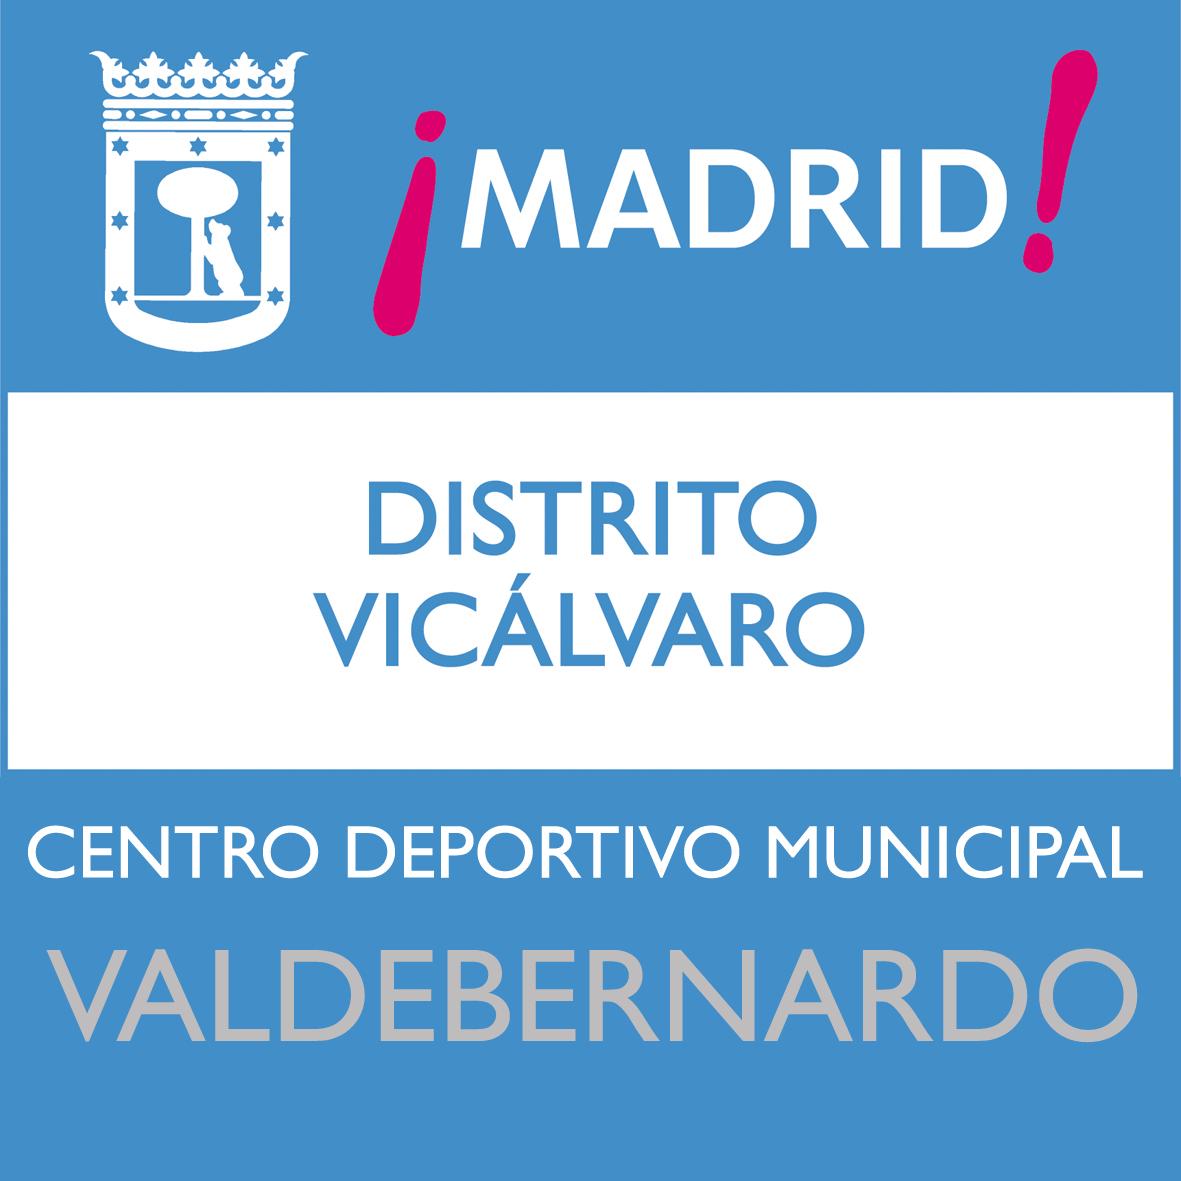 http://vicalvablog.blogspot.com.es/2014/09/35-juegos-deportivos-municipales-cdm_3.html